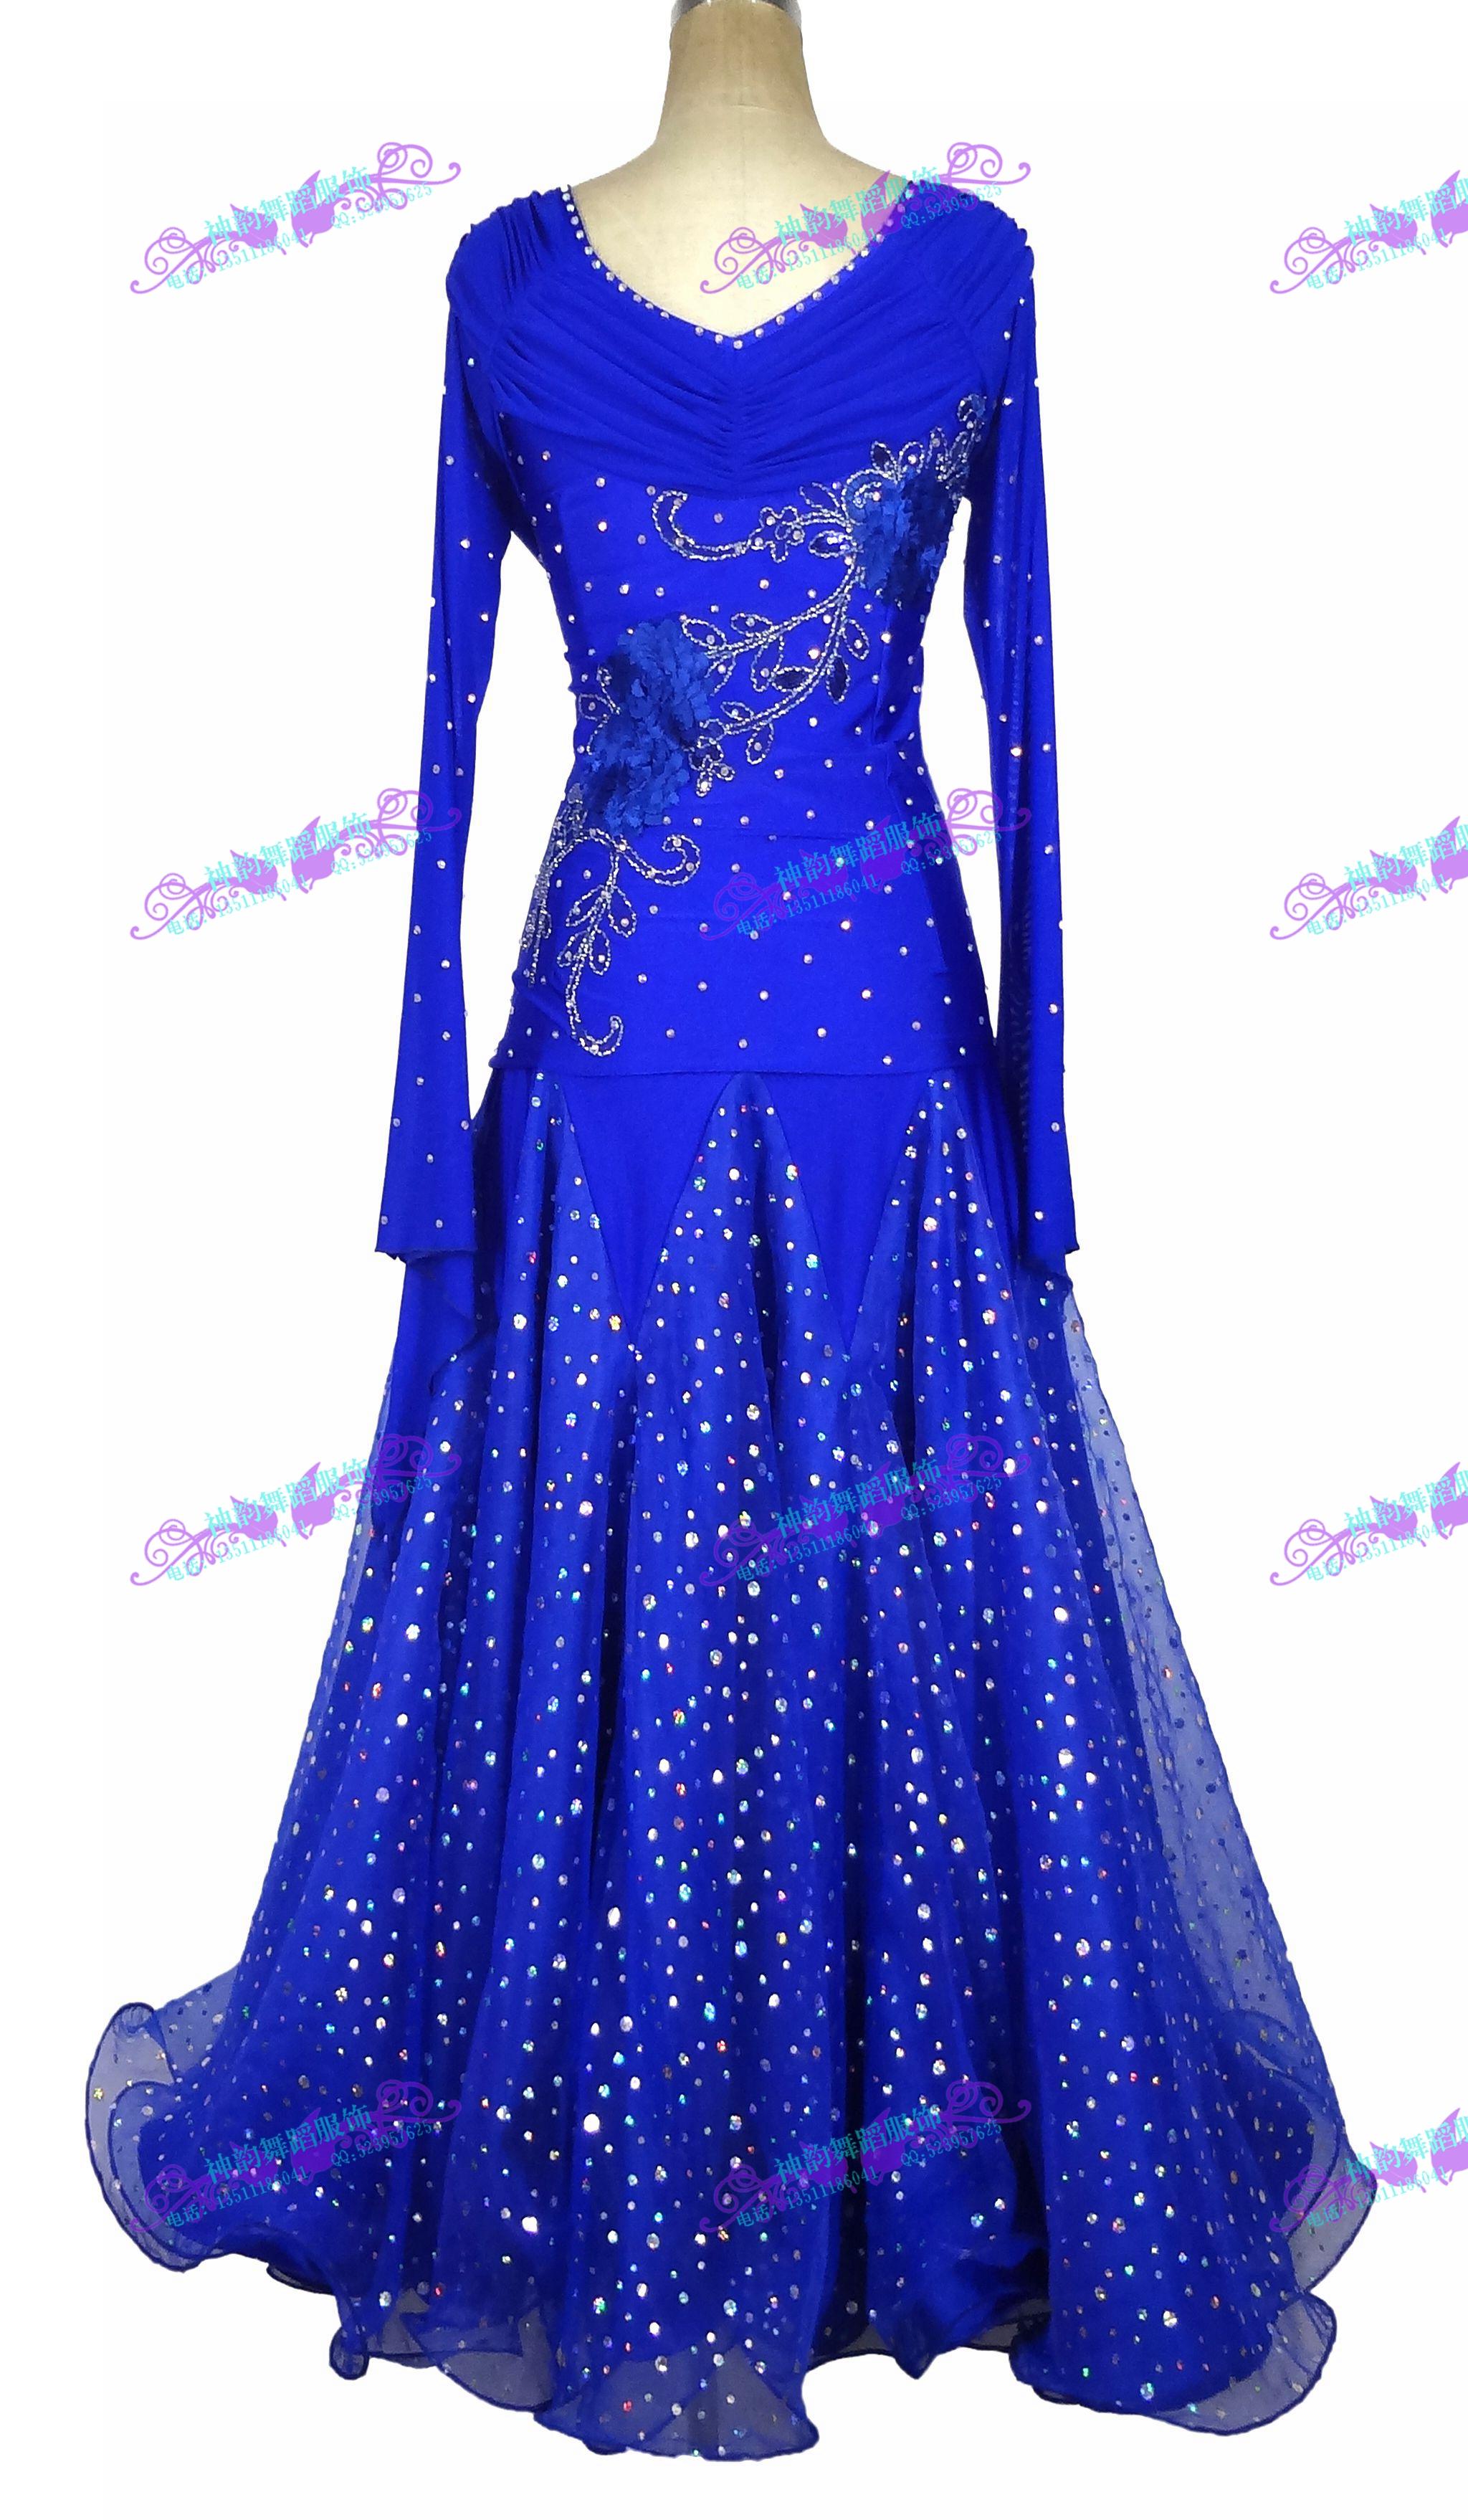 Одежда для танца Spirit dance dress lx089 solowheel spirit